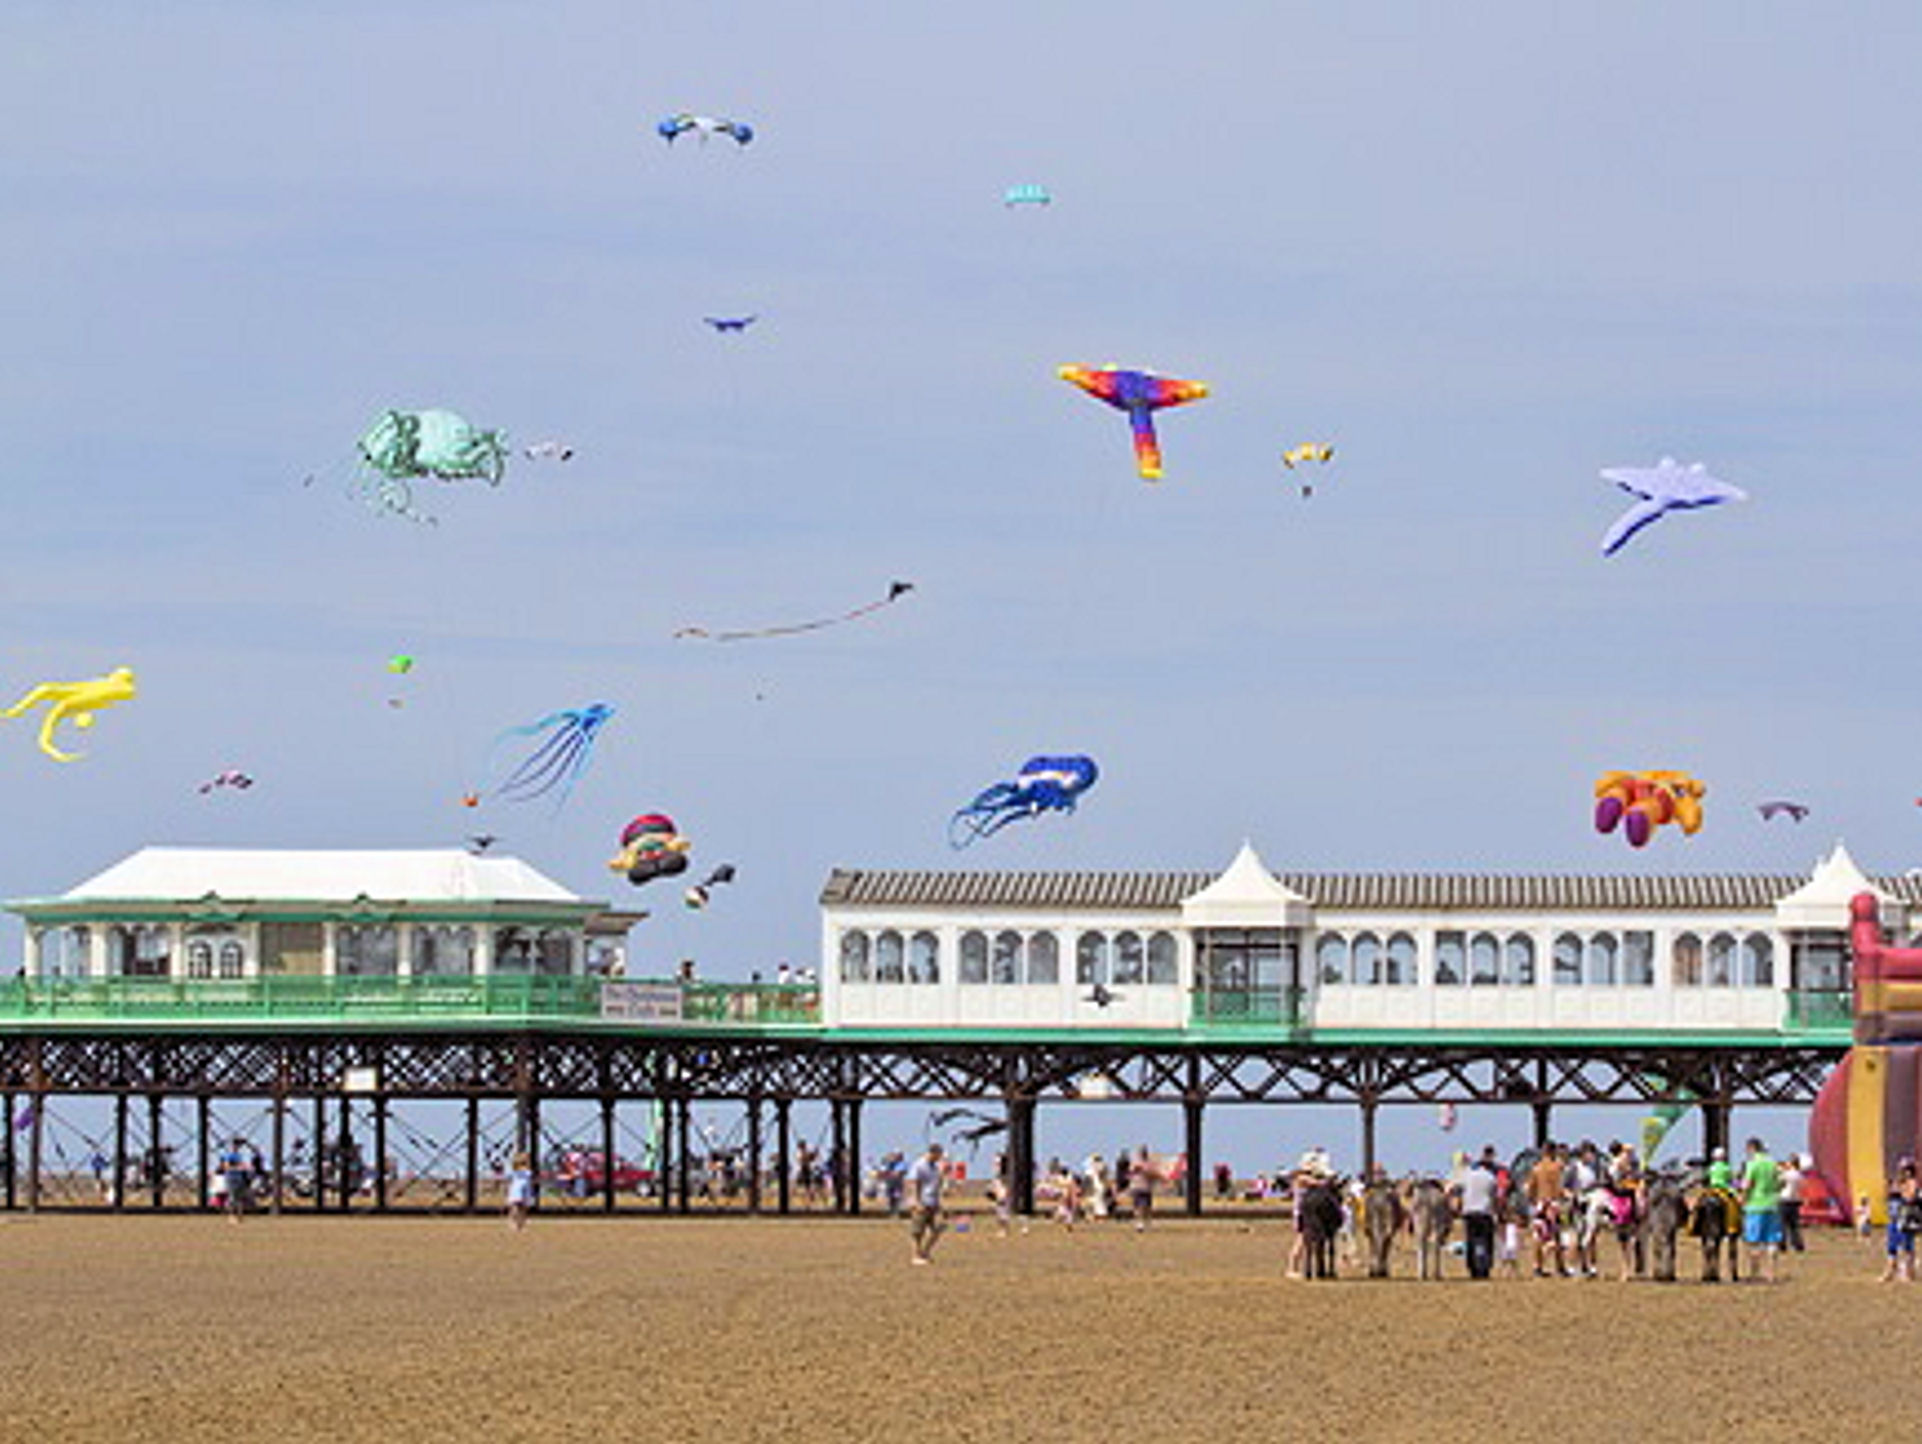 Flats-kites